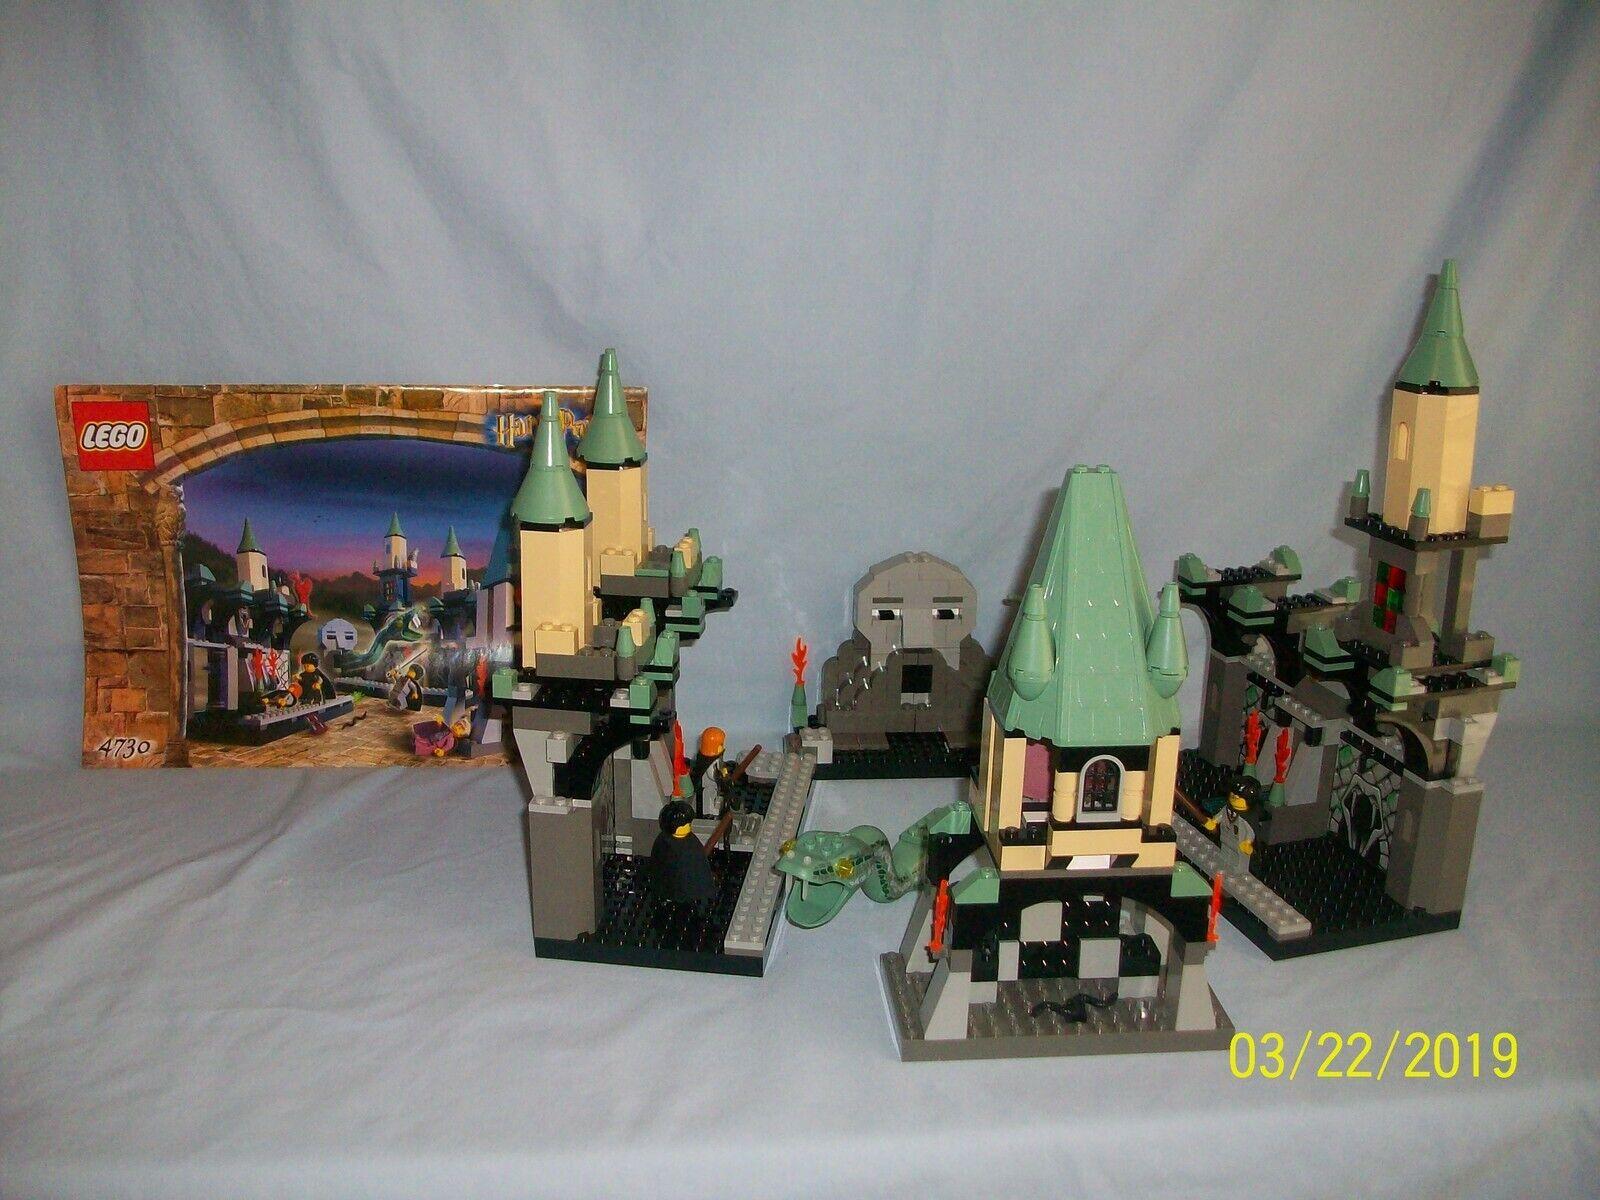 Lego Set 4730 Chamber of Secrets HARRY POTTER w  instructions 100% complete